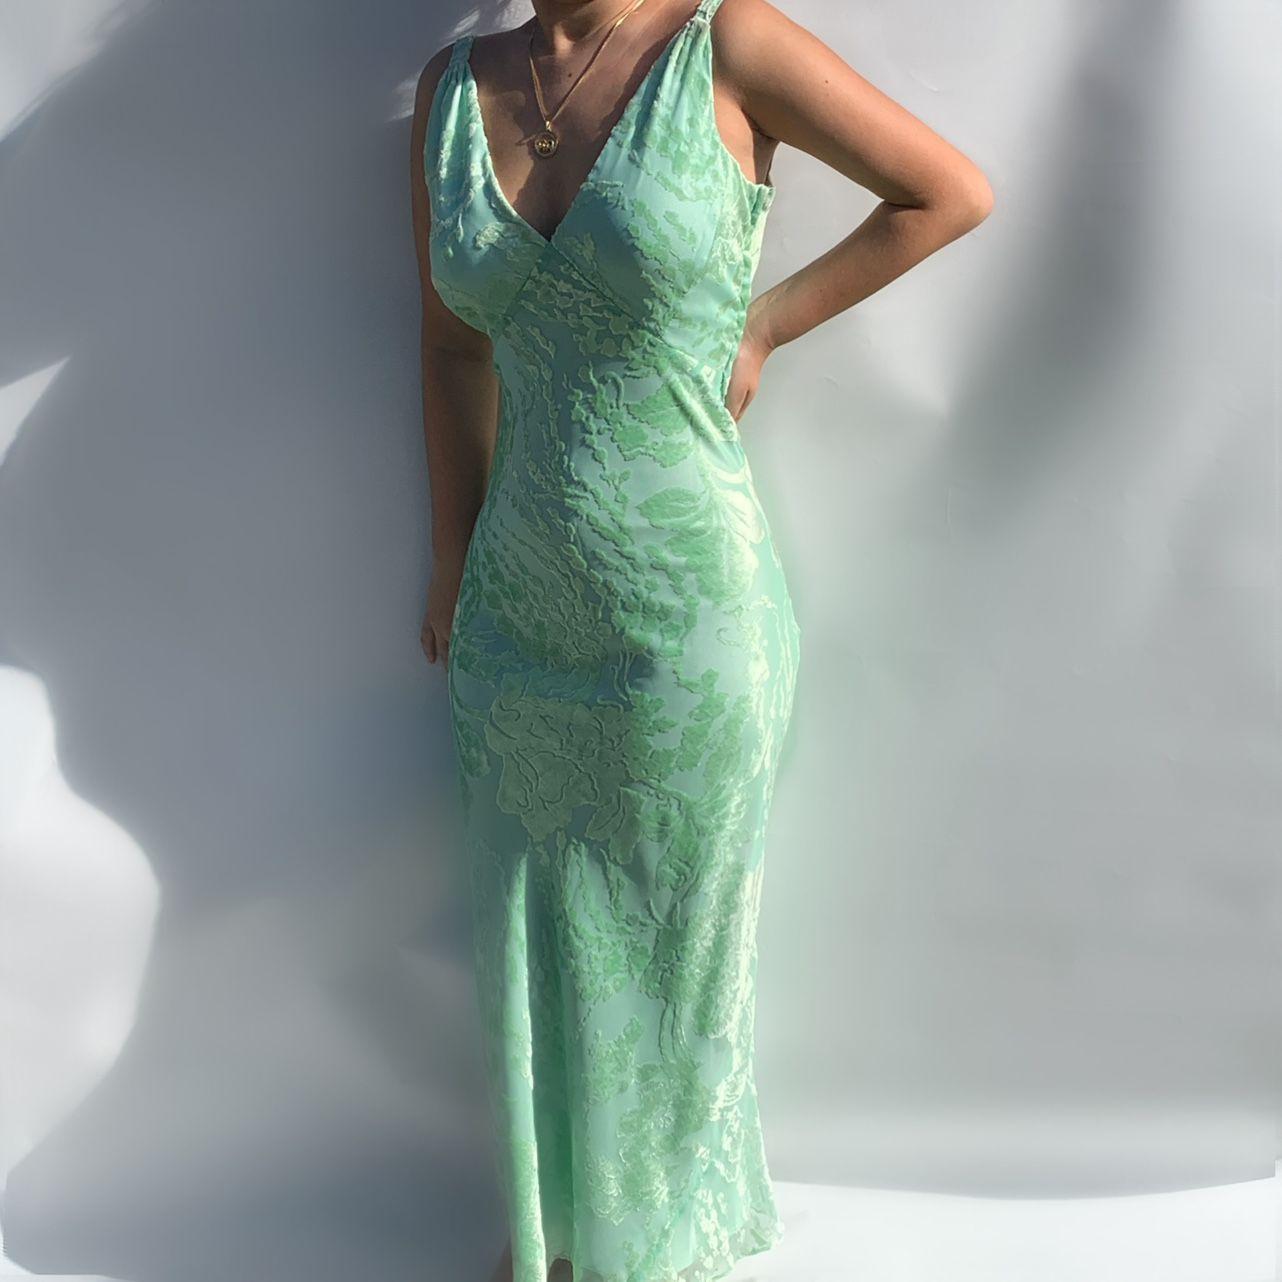 Iridescent Shimmering Light Pink Dress Still Depop Green Formal Dresses 90s Prom Dresses Formal Dresses [ 1282 x 1282 Pixel ]